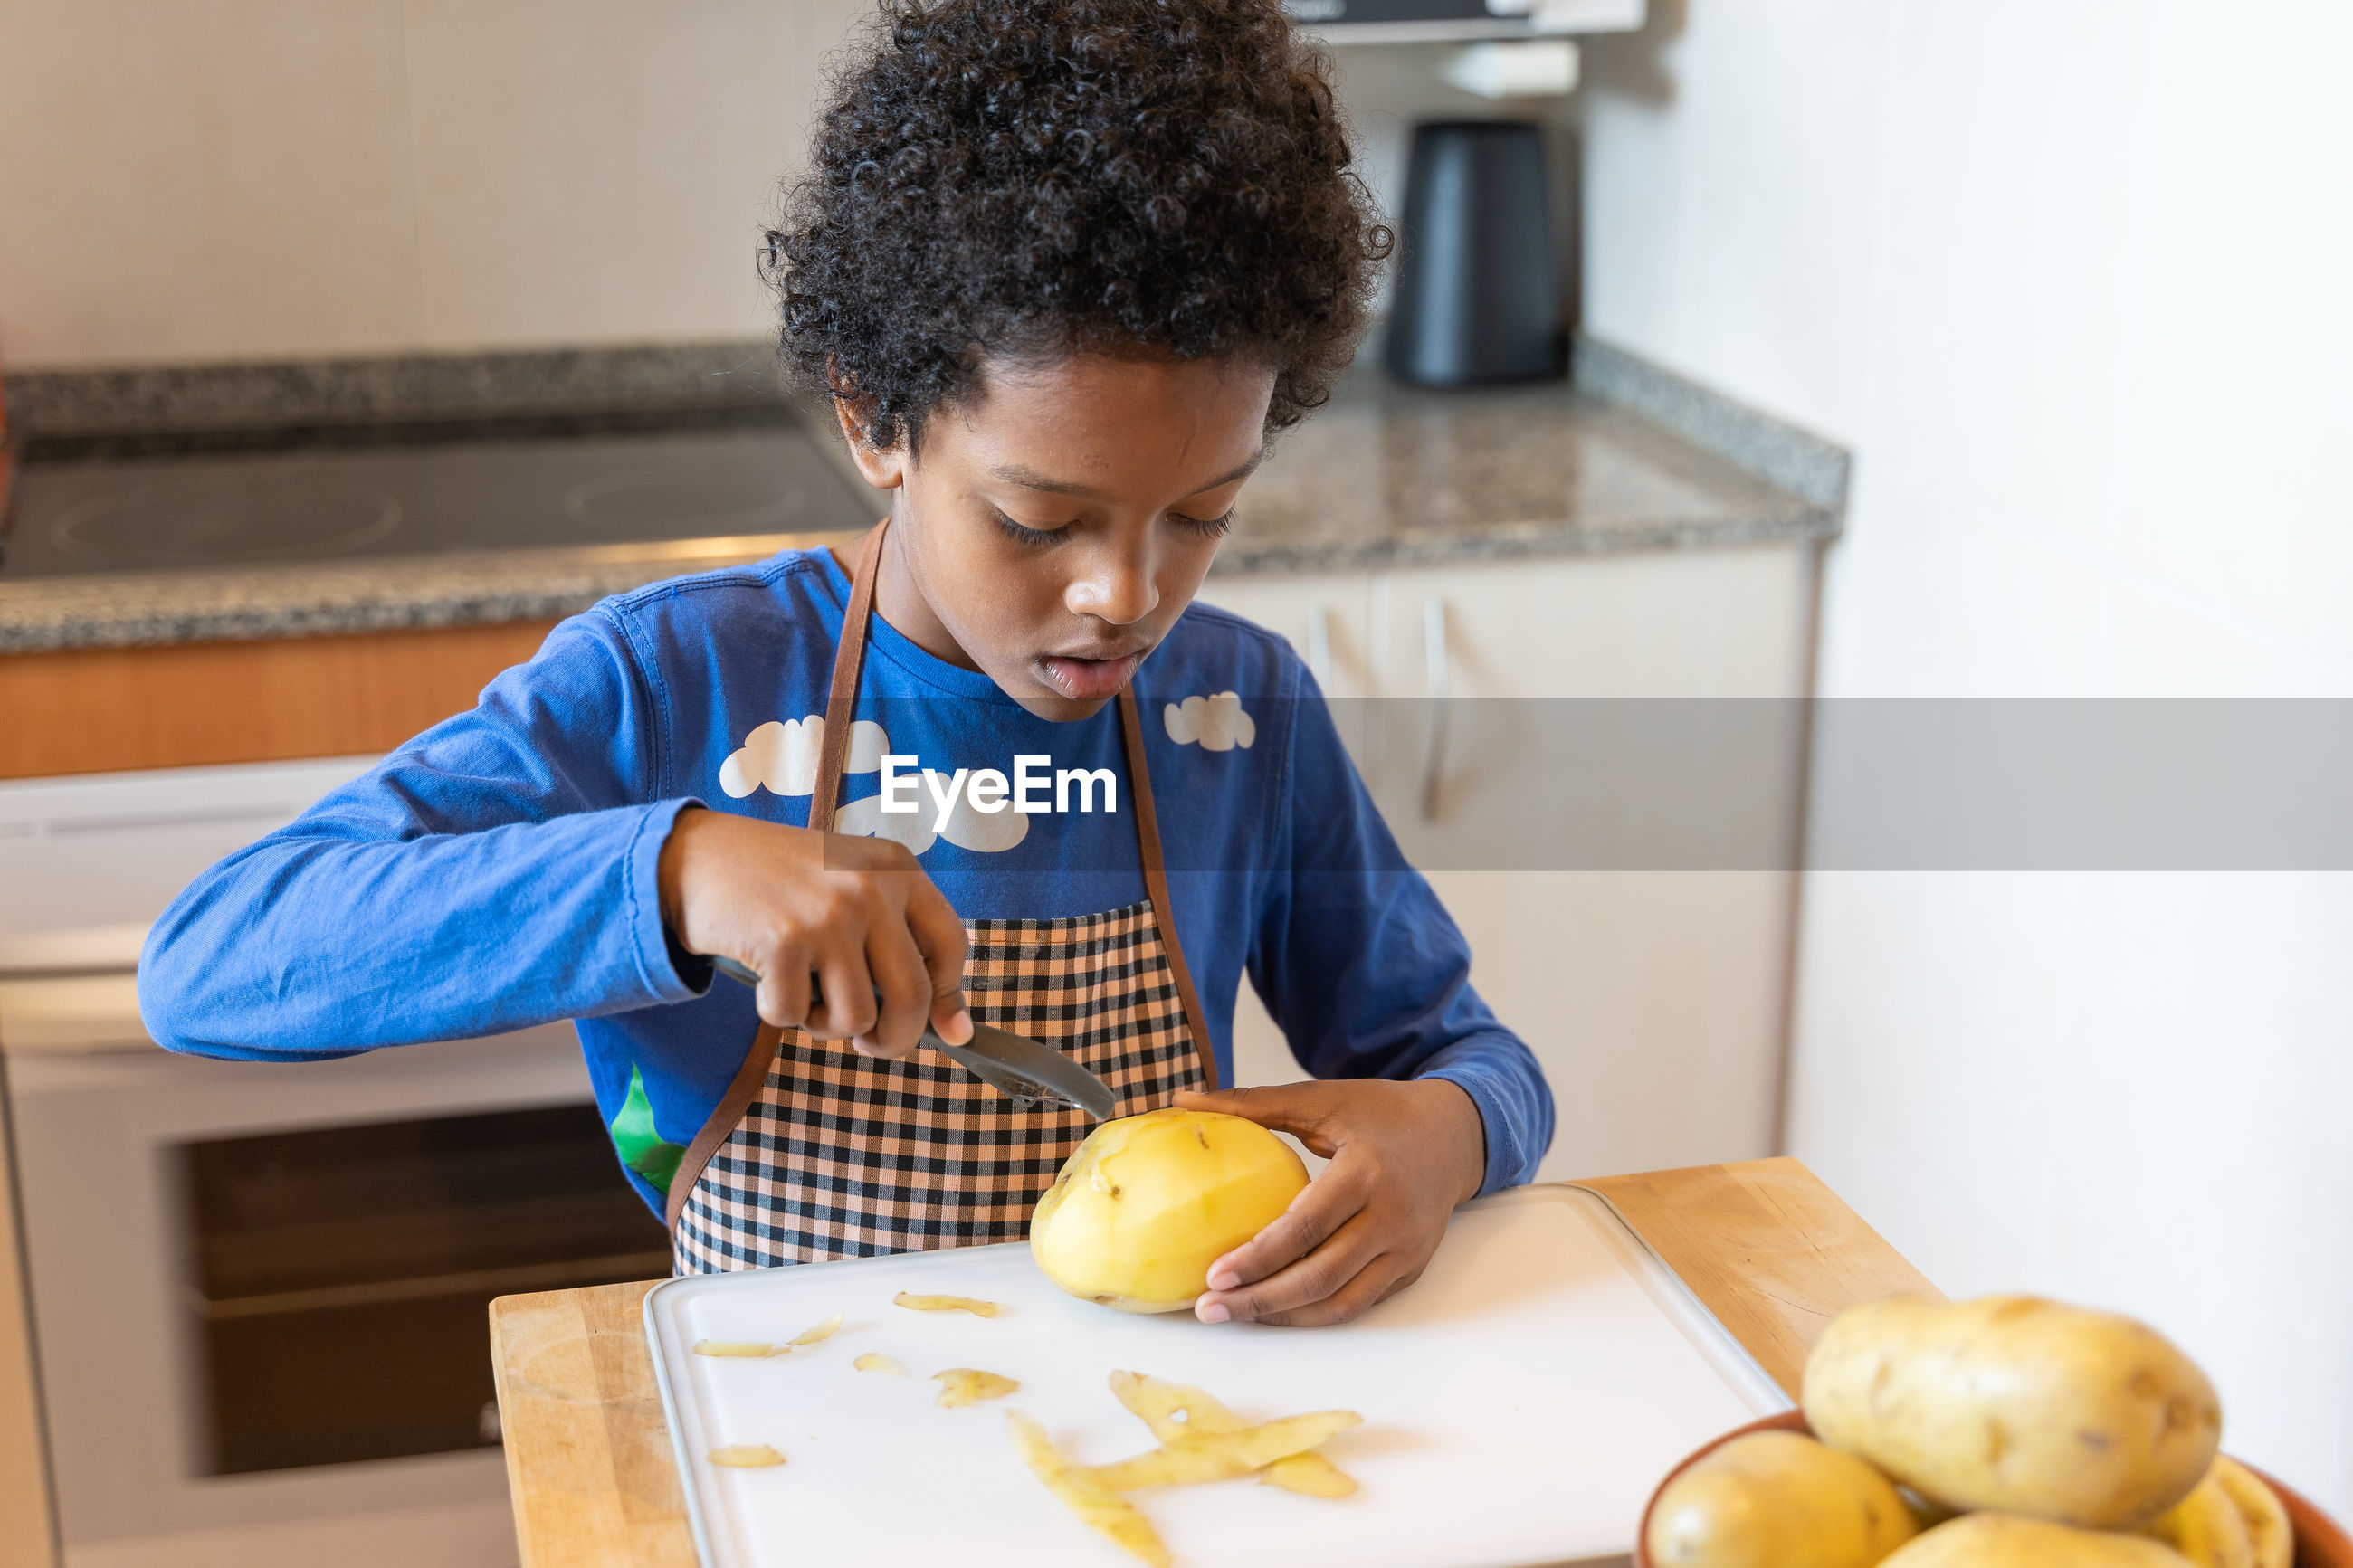 Boy peeling raw potato at home